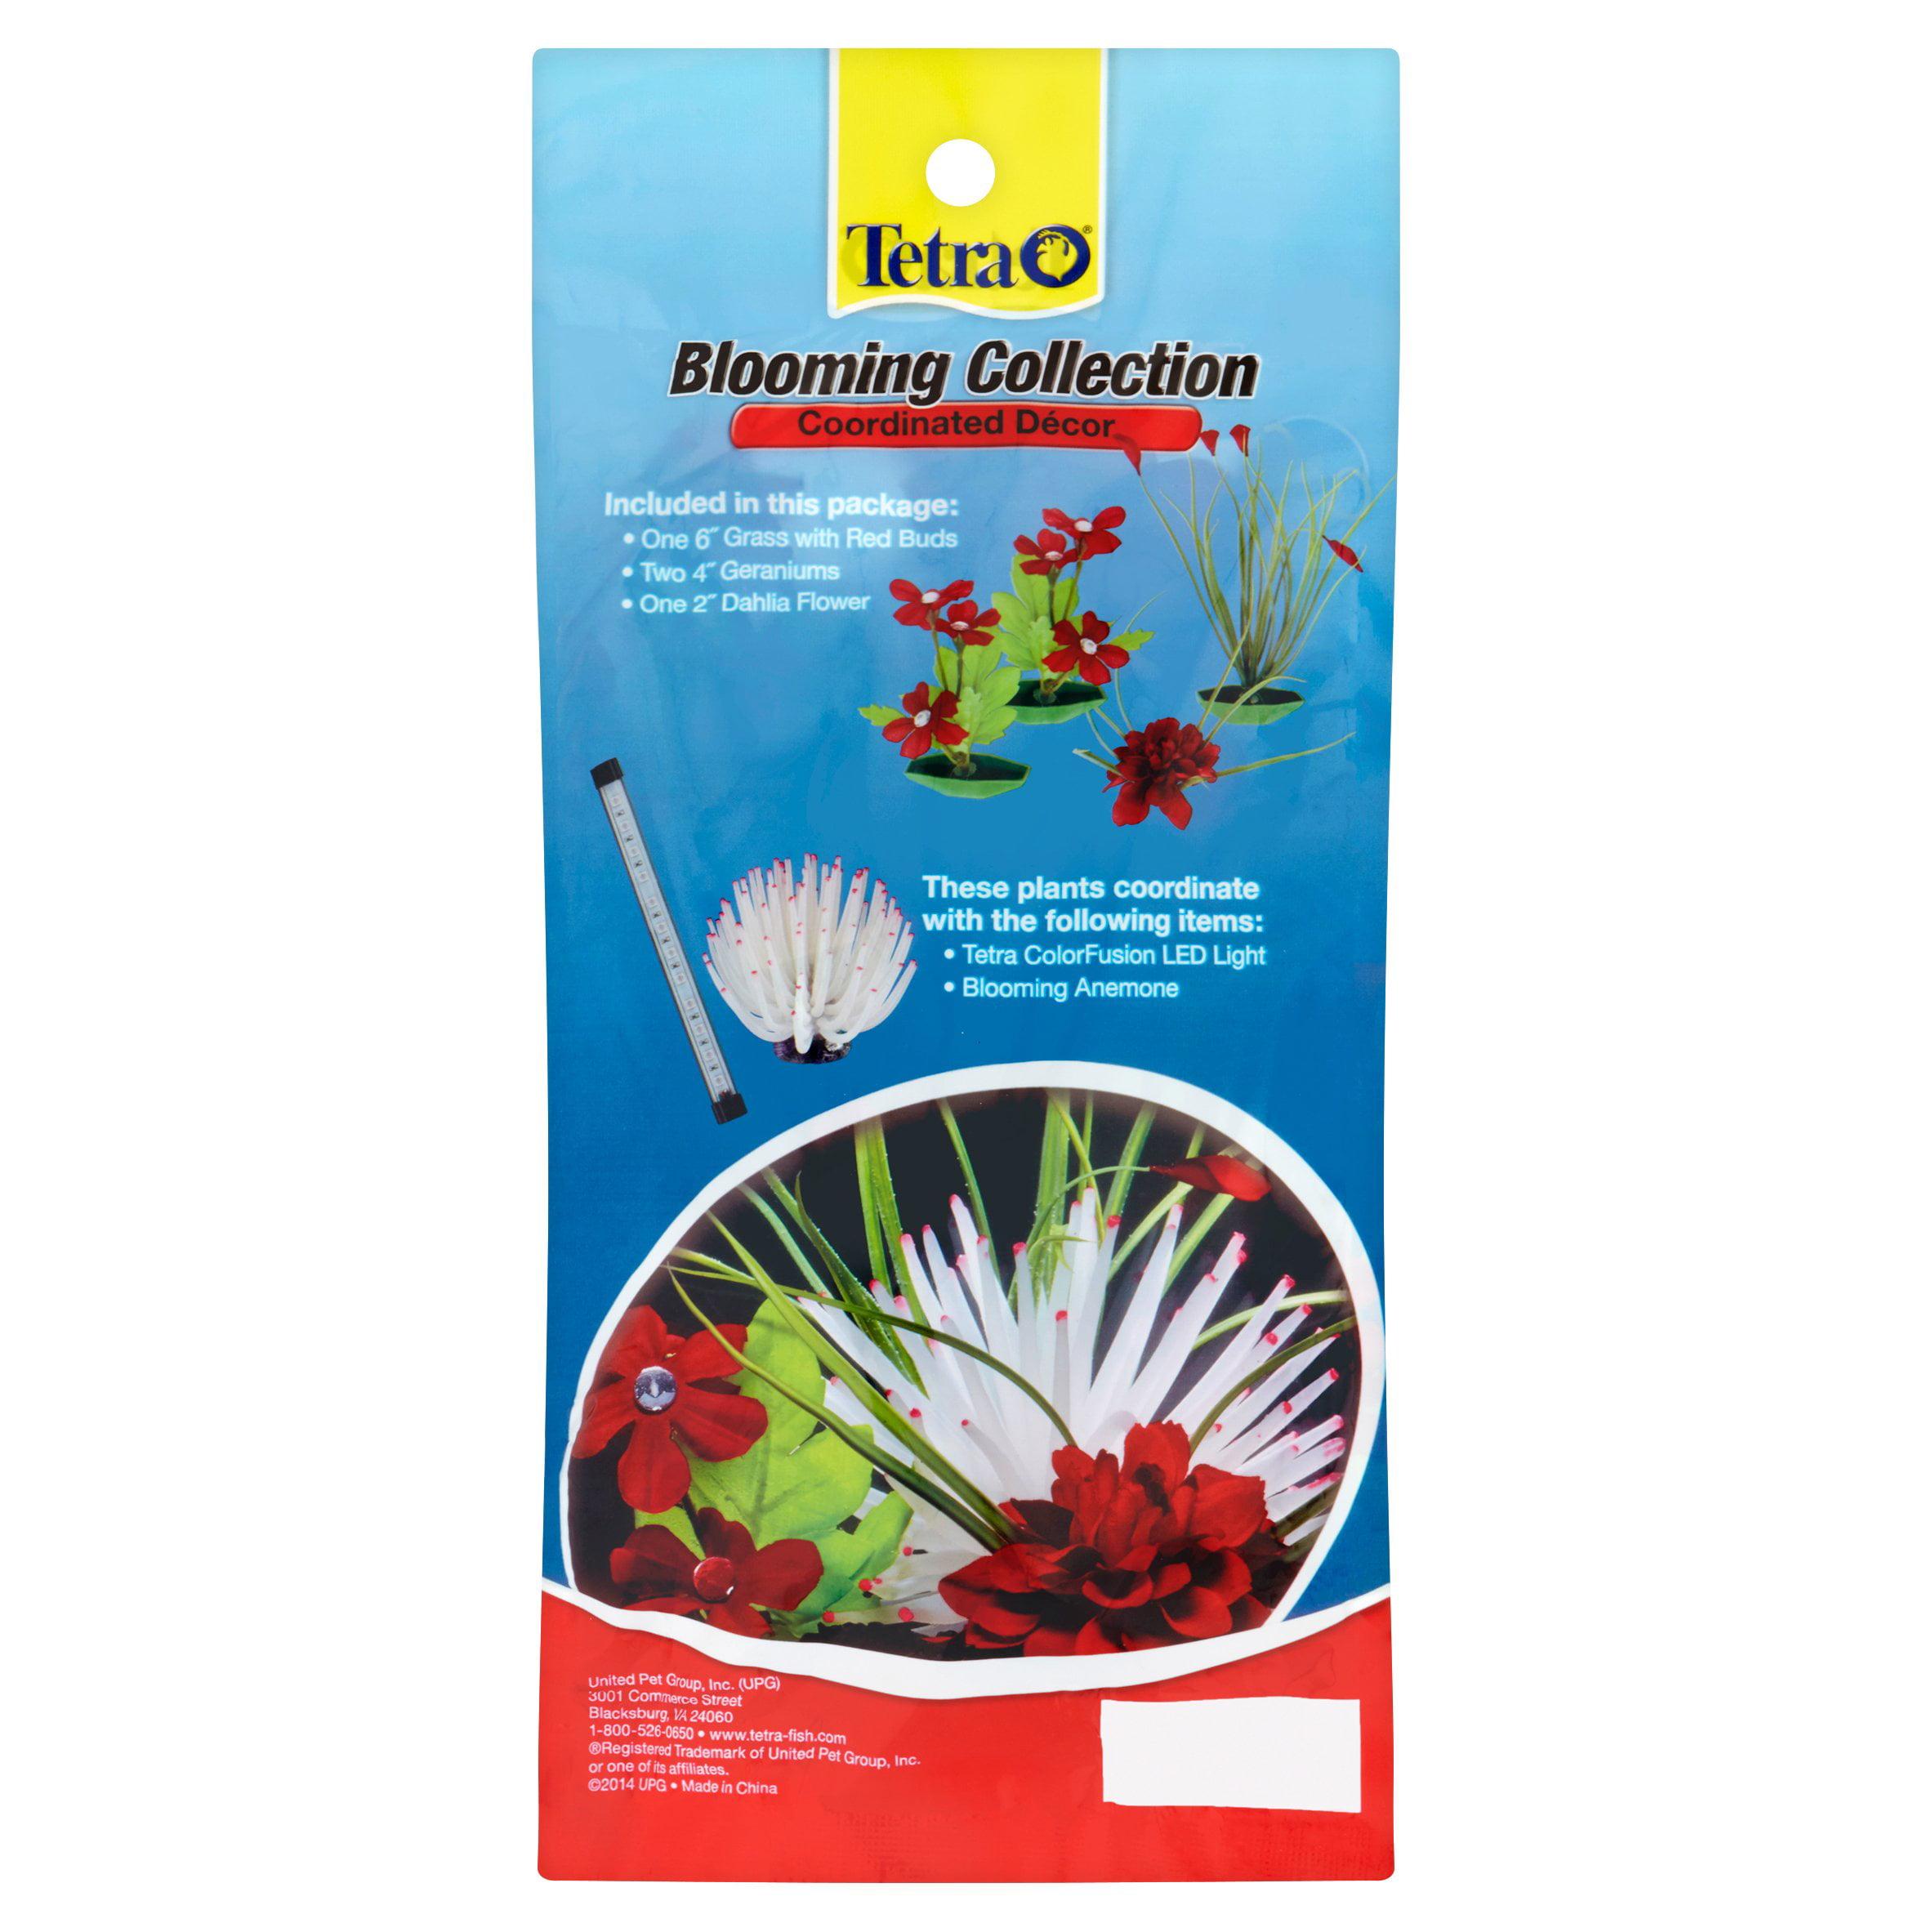 Tetra Blooming Collections Coordinated Décor Aquarium Plants, 4 ...